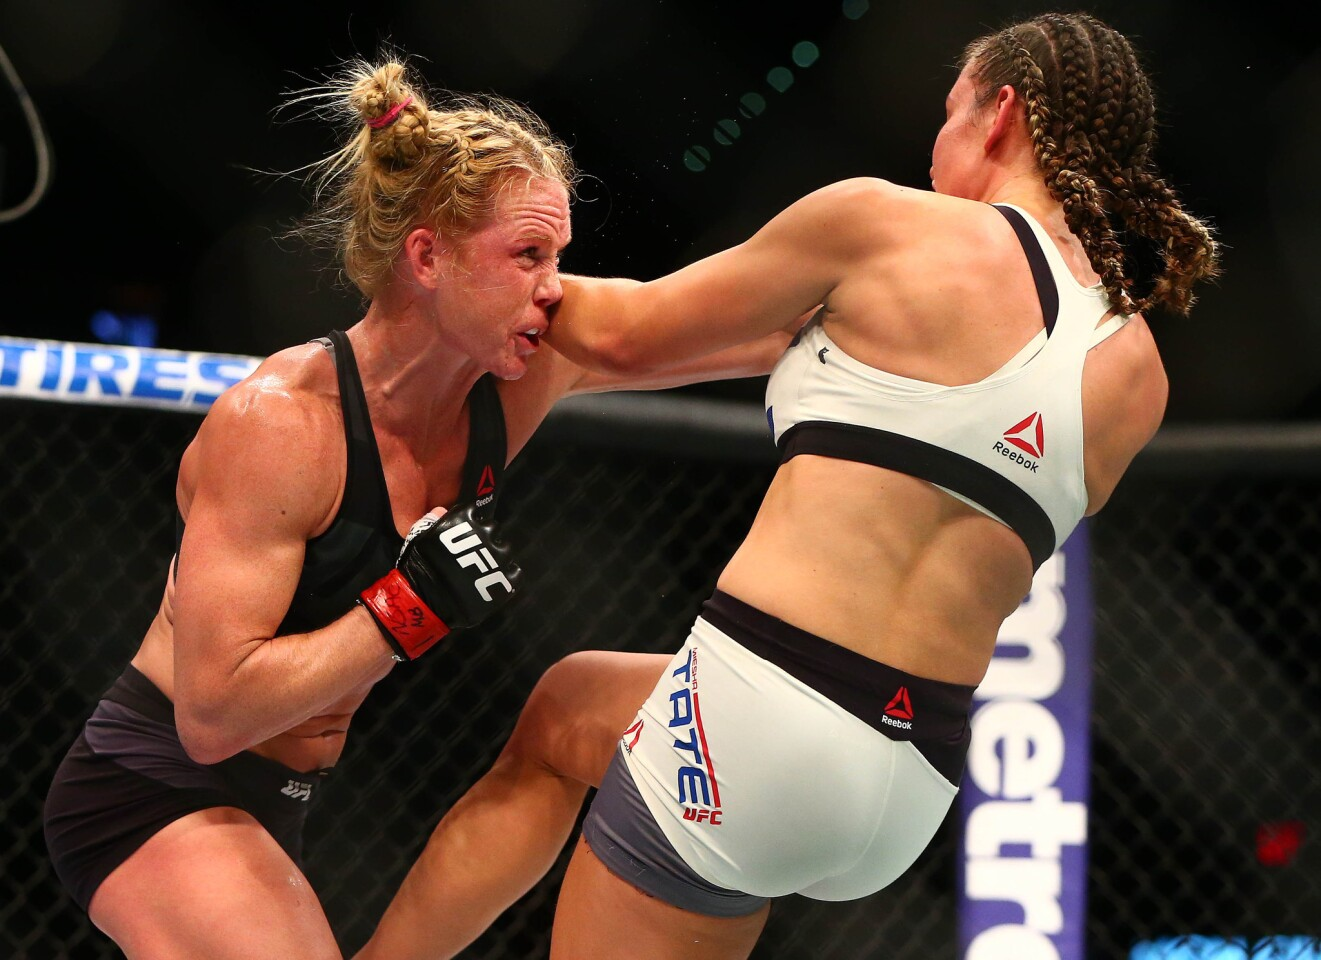 UFC 196: Holm vs Tate